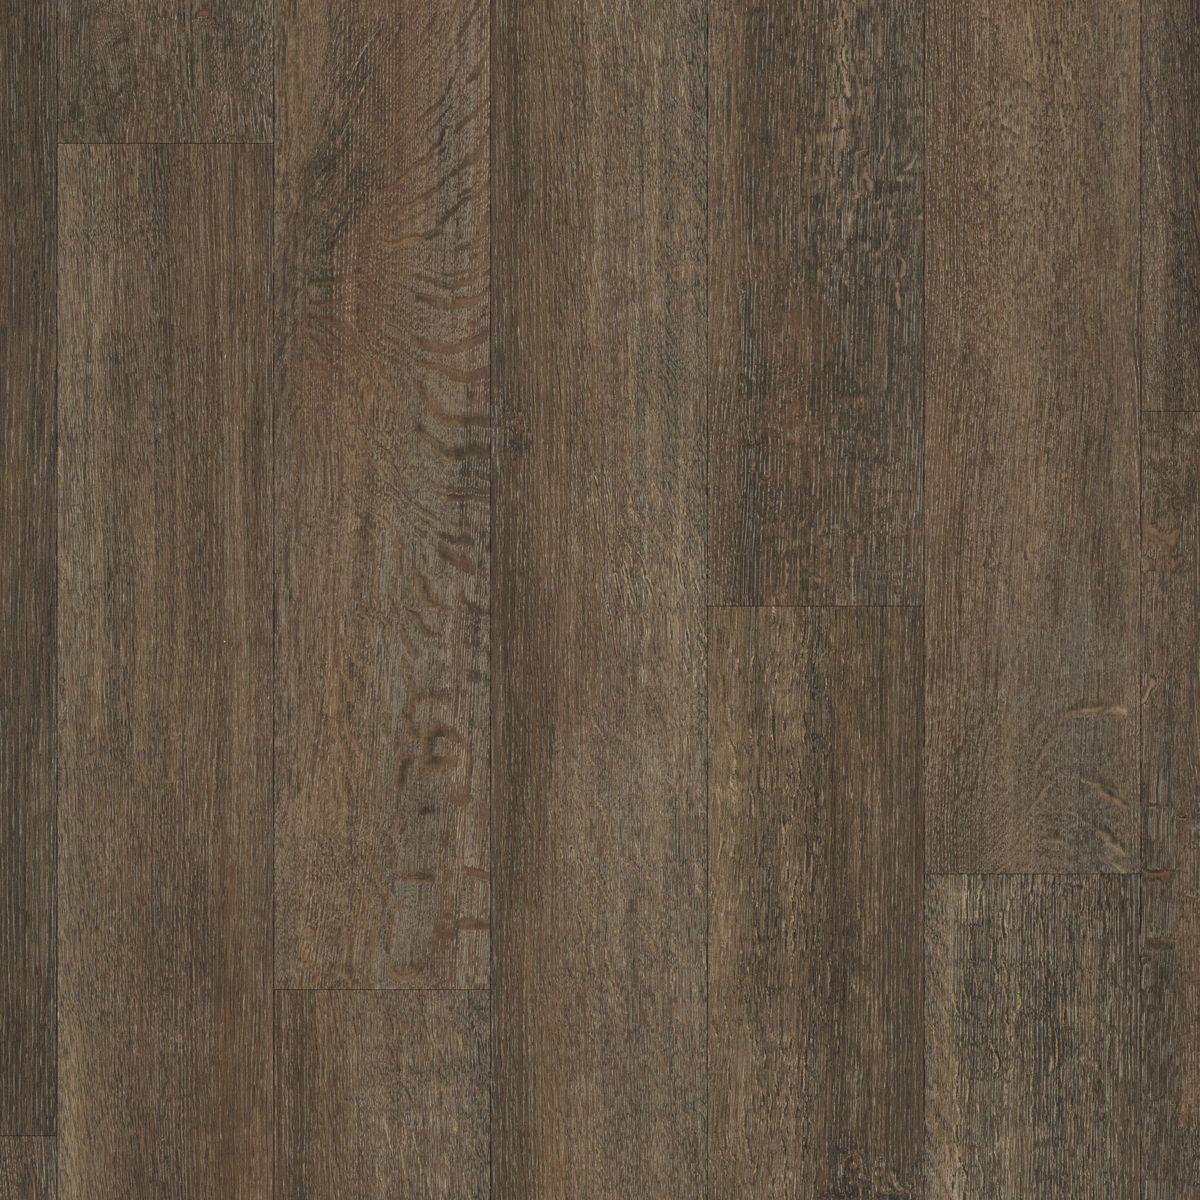 Karndean Van Gogh Brushed Oak Vgw88t Vinyl Flooring